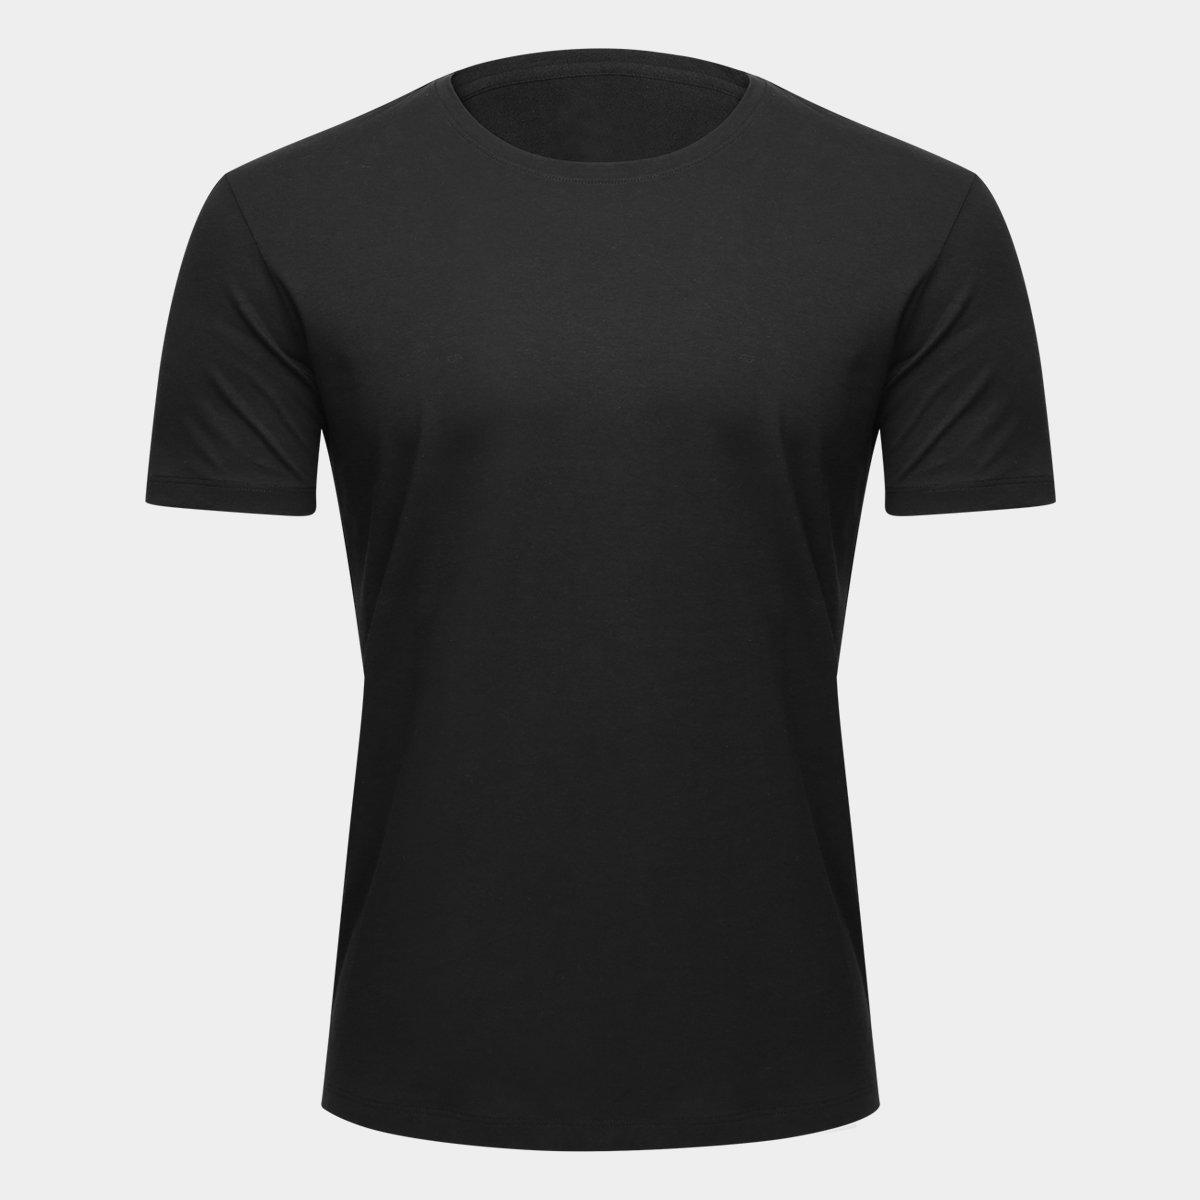 b0611874db1d1 Camiseta Nike Blank - Compre Agora